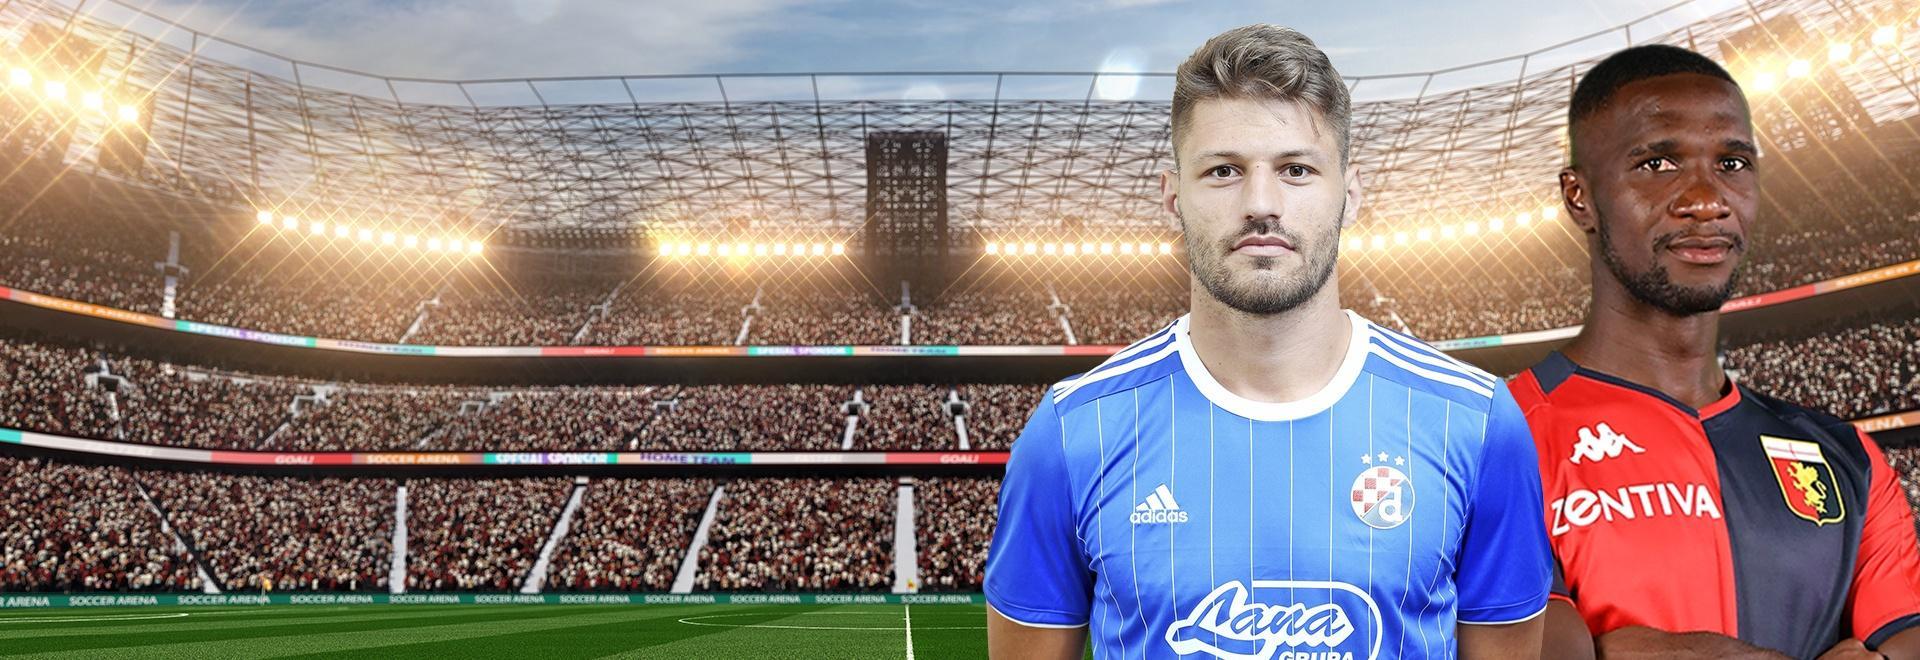 Dinamo Z. - Atalanta. 1a g.